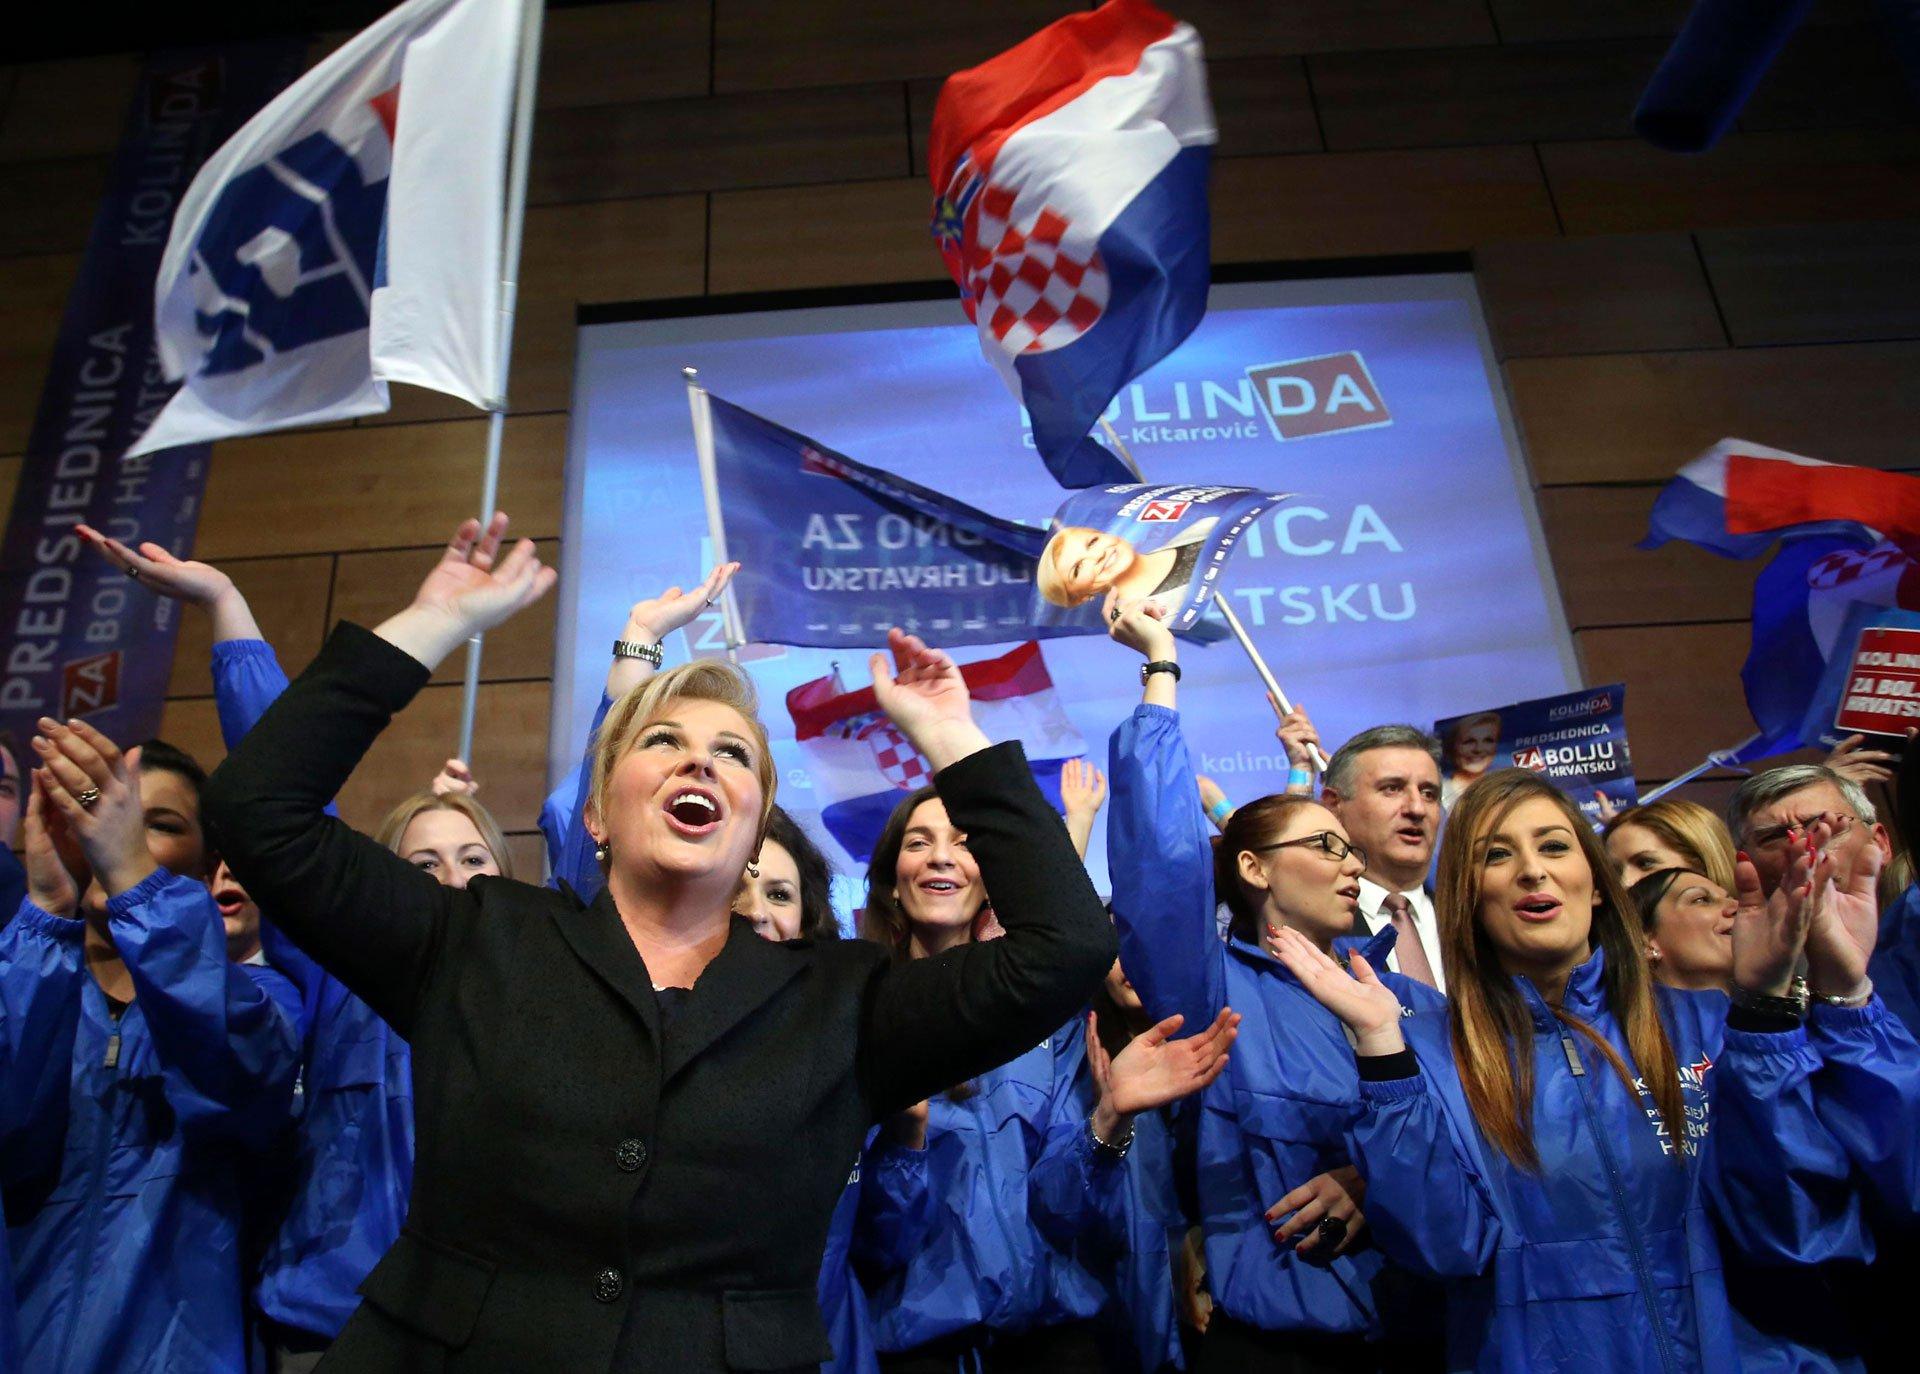 kolinda-grabarkitarovic-croatia-showed-it-wants-change_1419838767